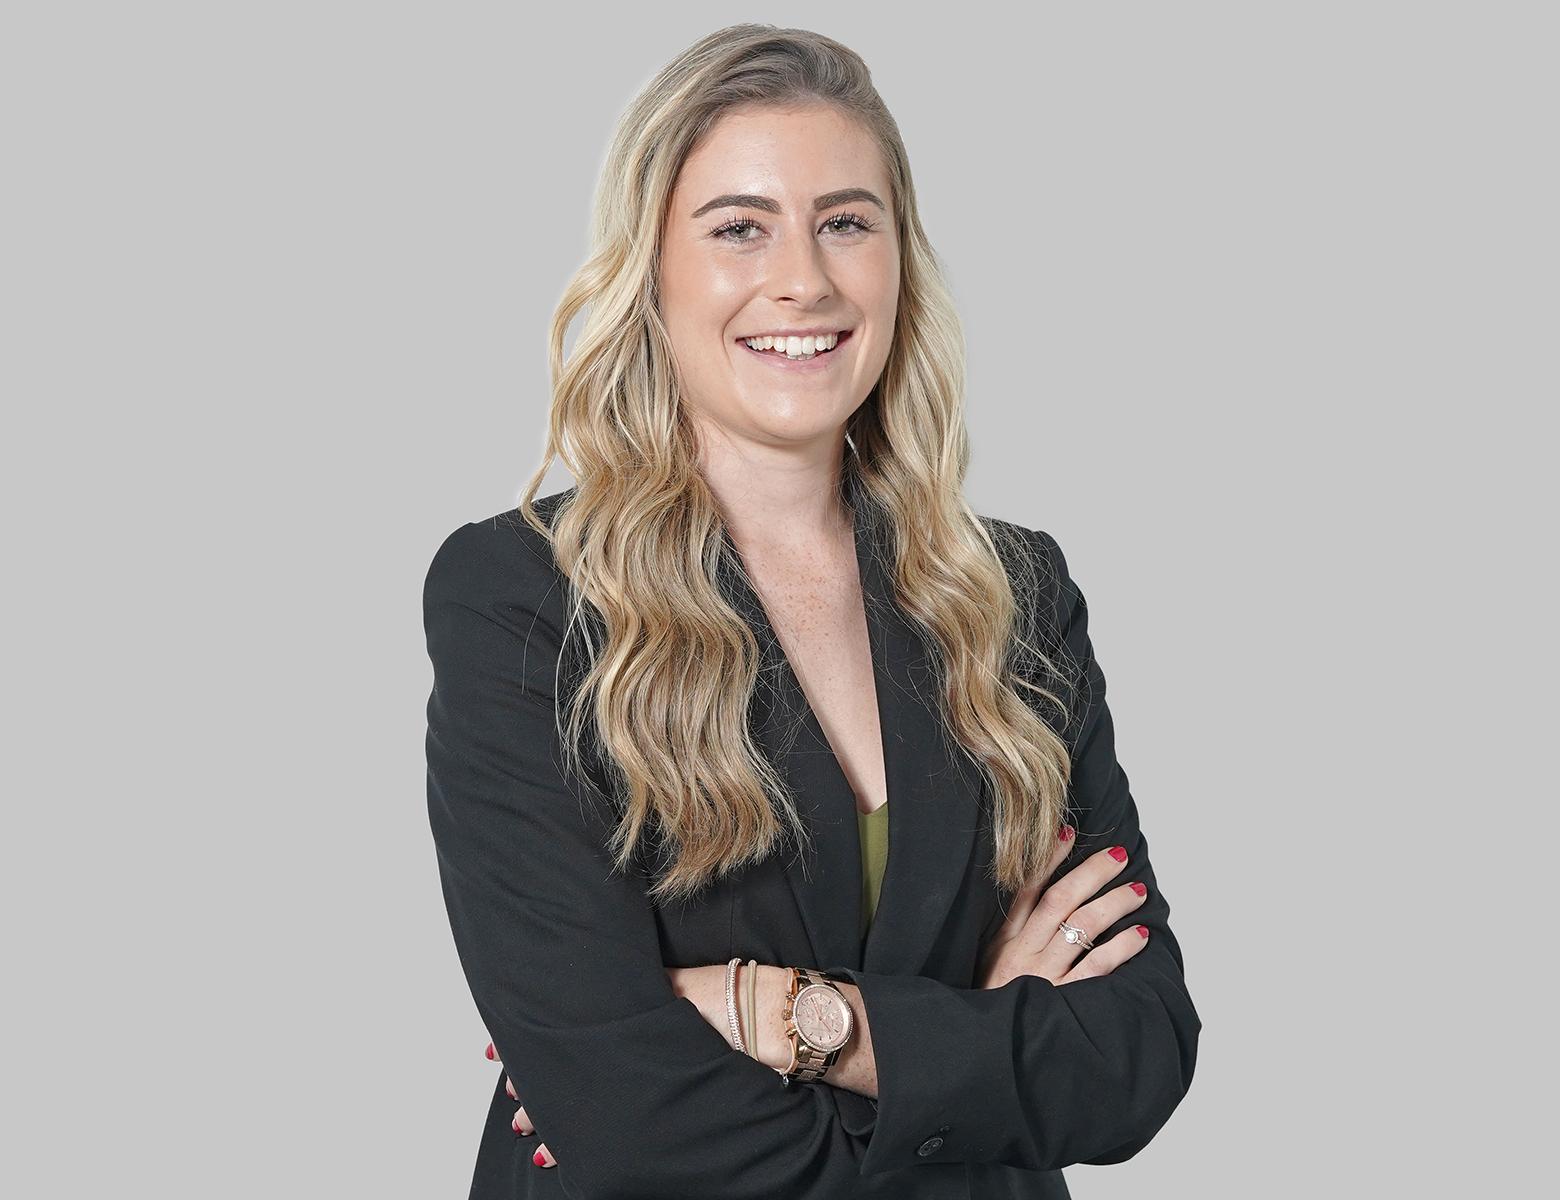 Megan Olivia Ely